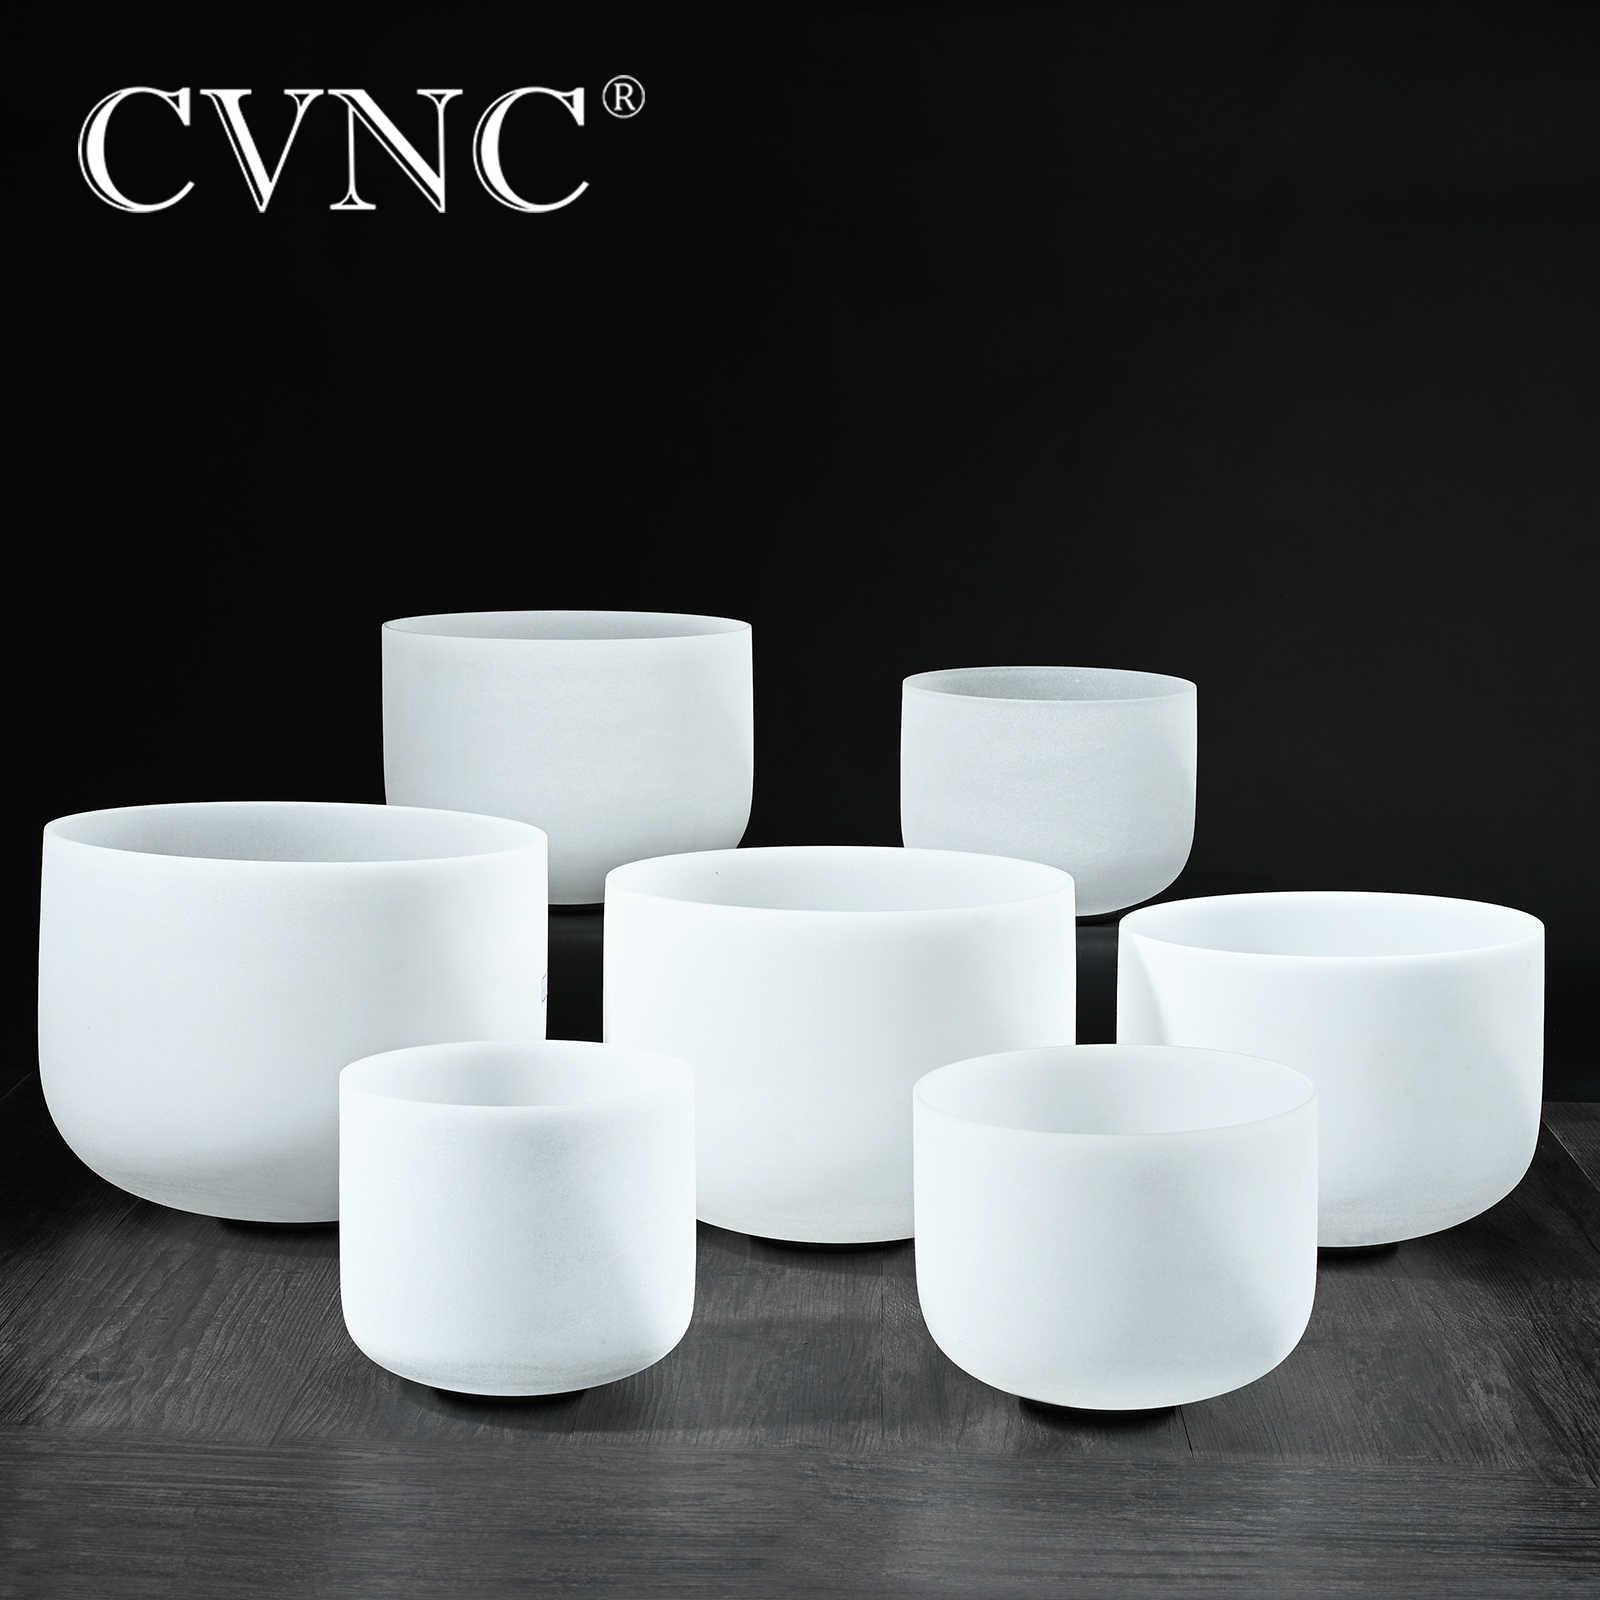 "CVNC 6 ""-12"" ملاحظة CDEFGAB مجموعة من 7 قطعة شقرا متجمد الكوارتز الكريستال جرس الموسيقى"